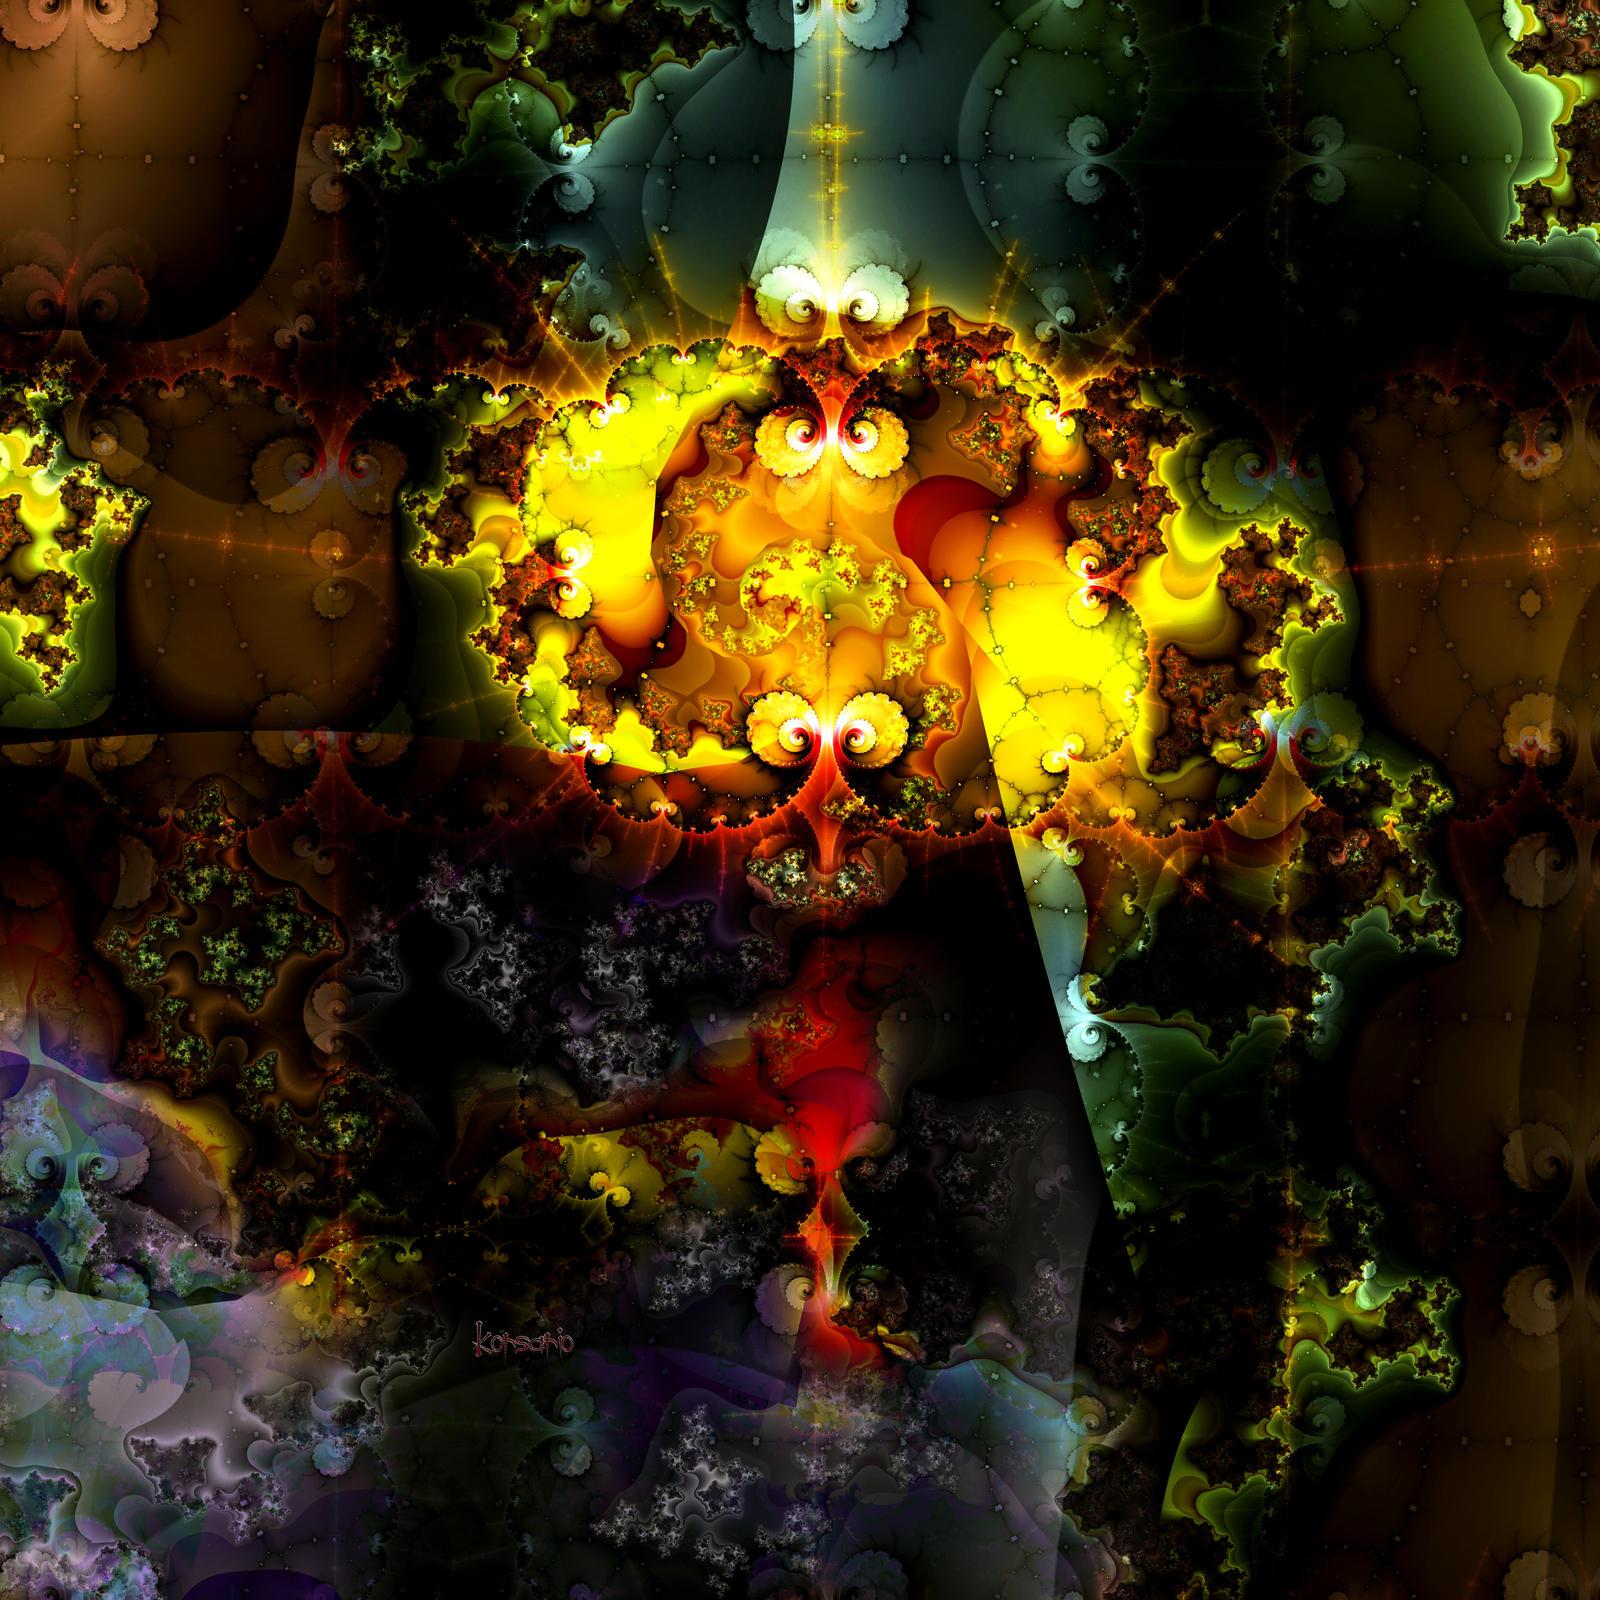 Midnight In The Garden Of Good And Evil By Ivankorsario On Deviantart